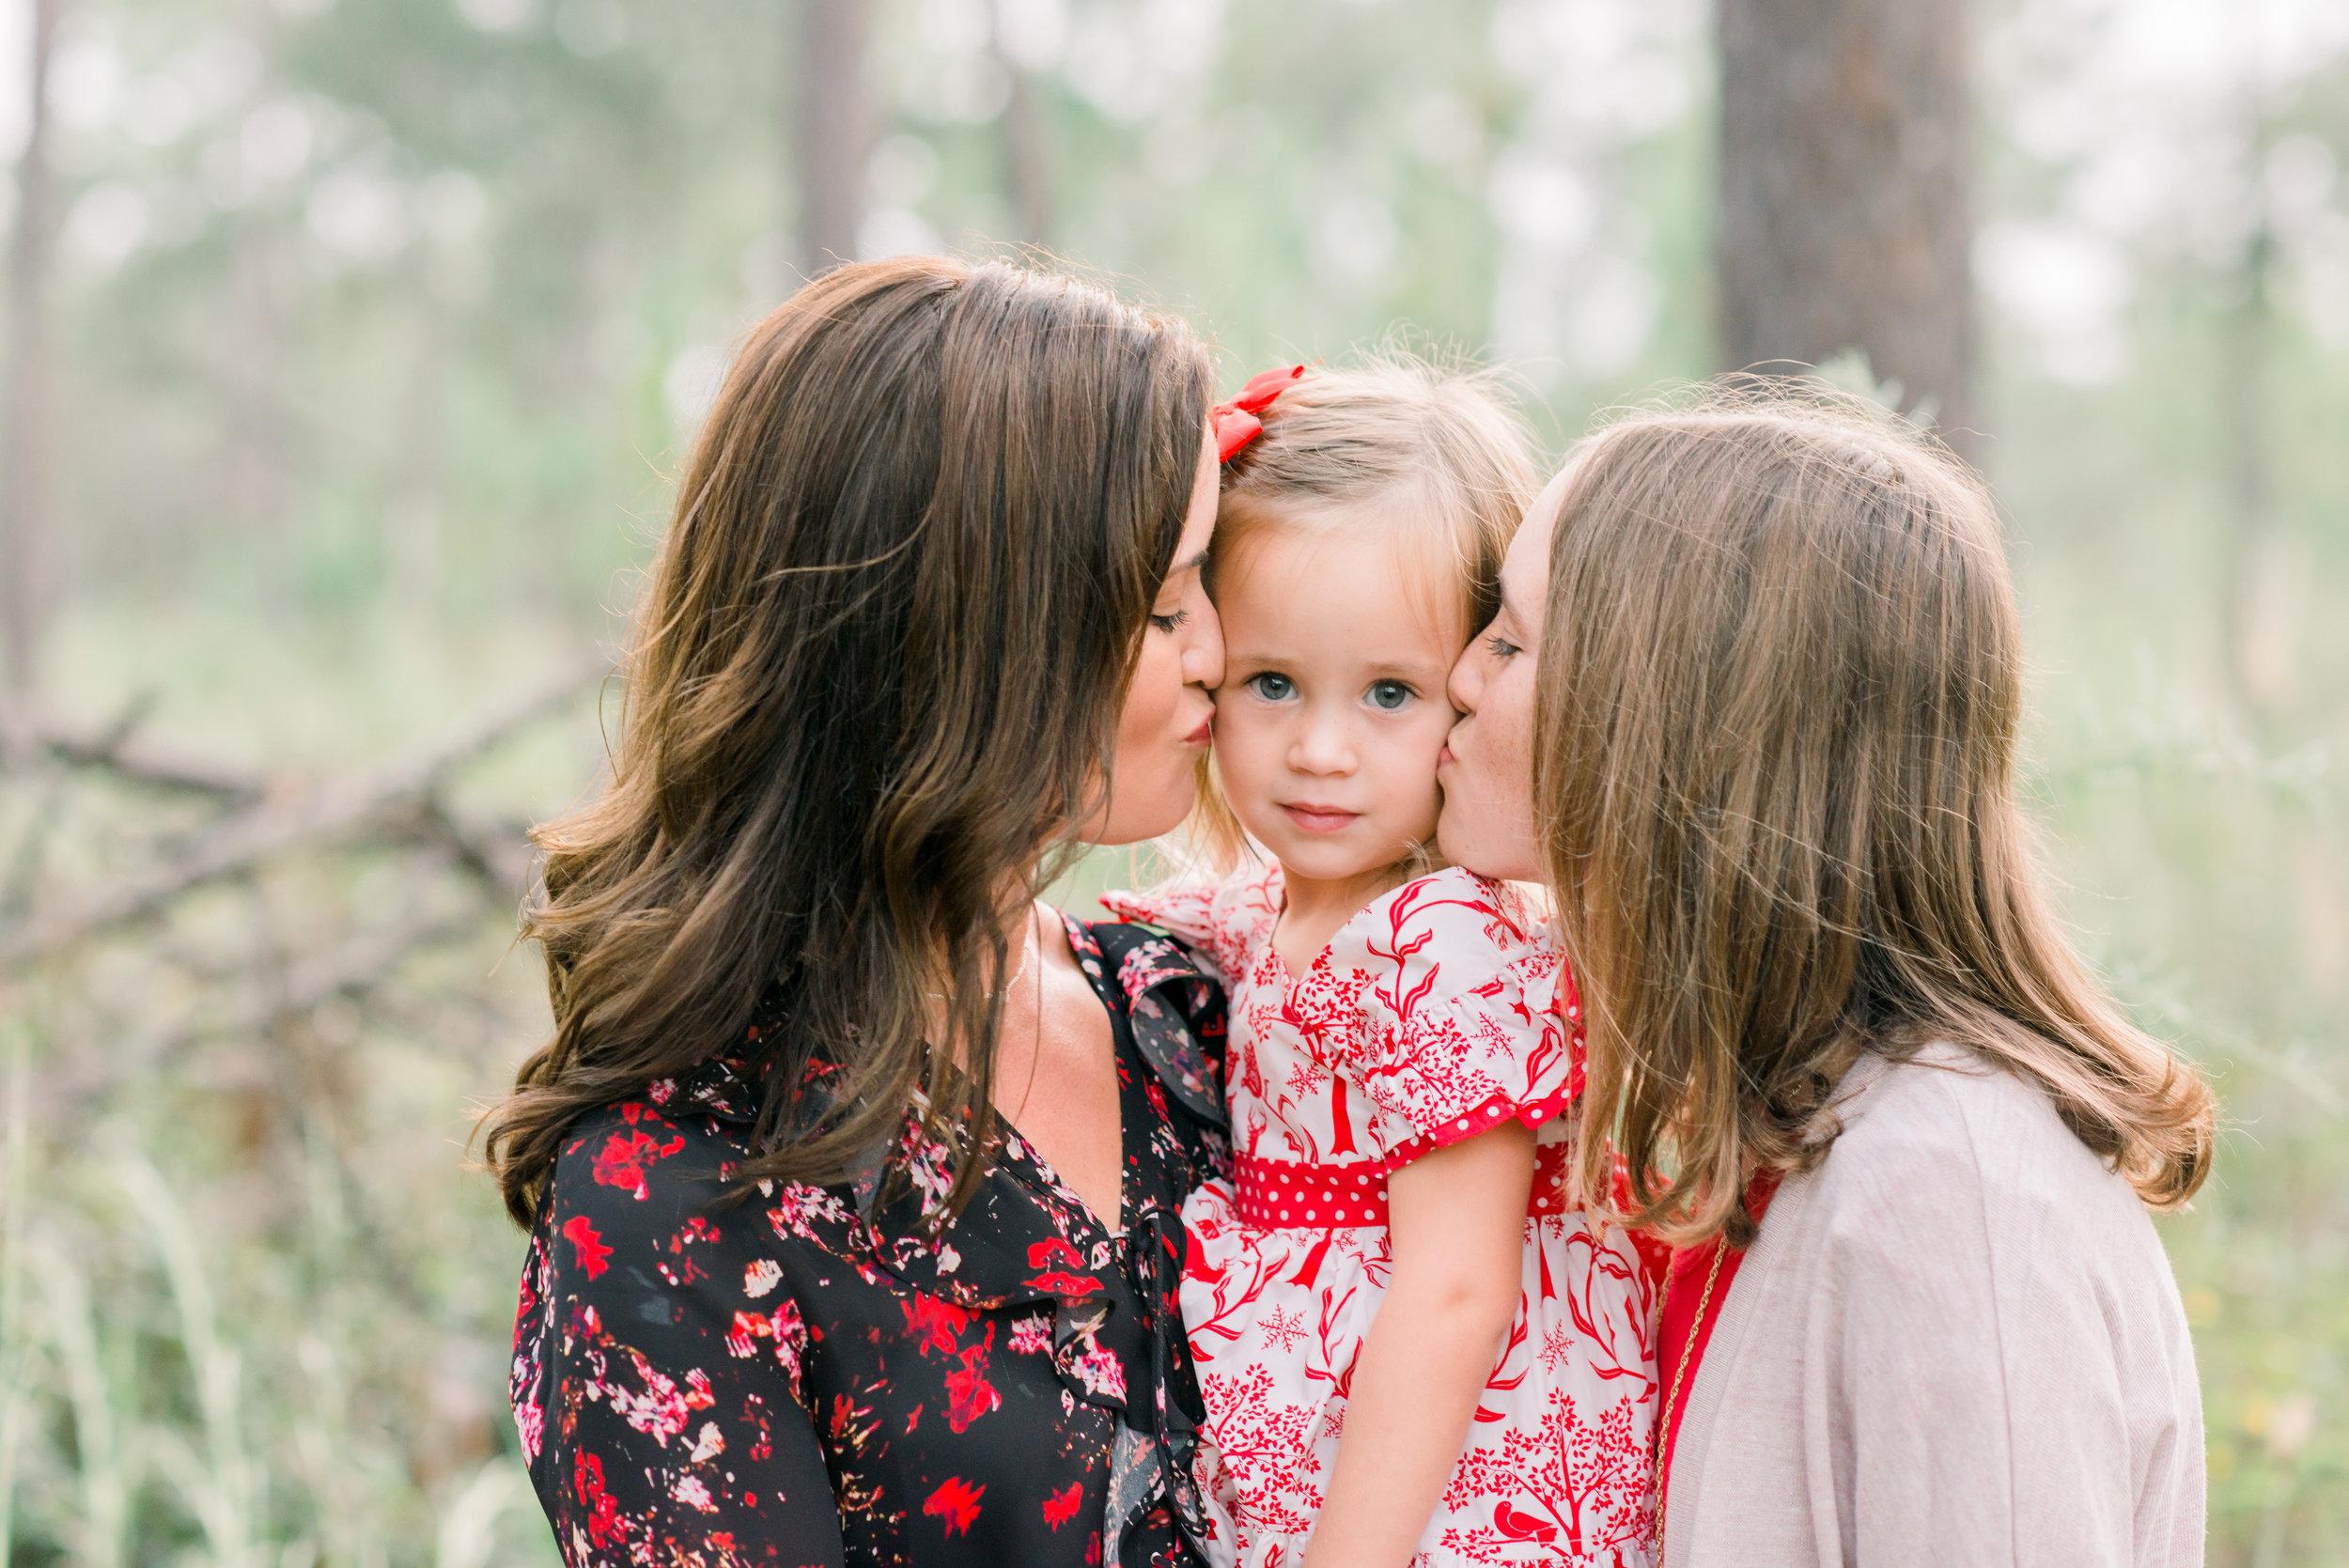 KateTaramykinStudios-Wekiva-Springs-Family-Photographer-Donald-8.jpg